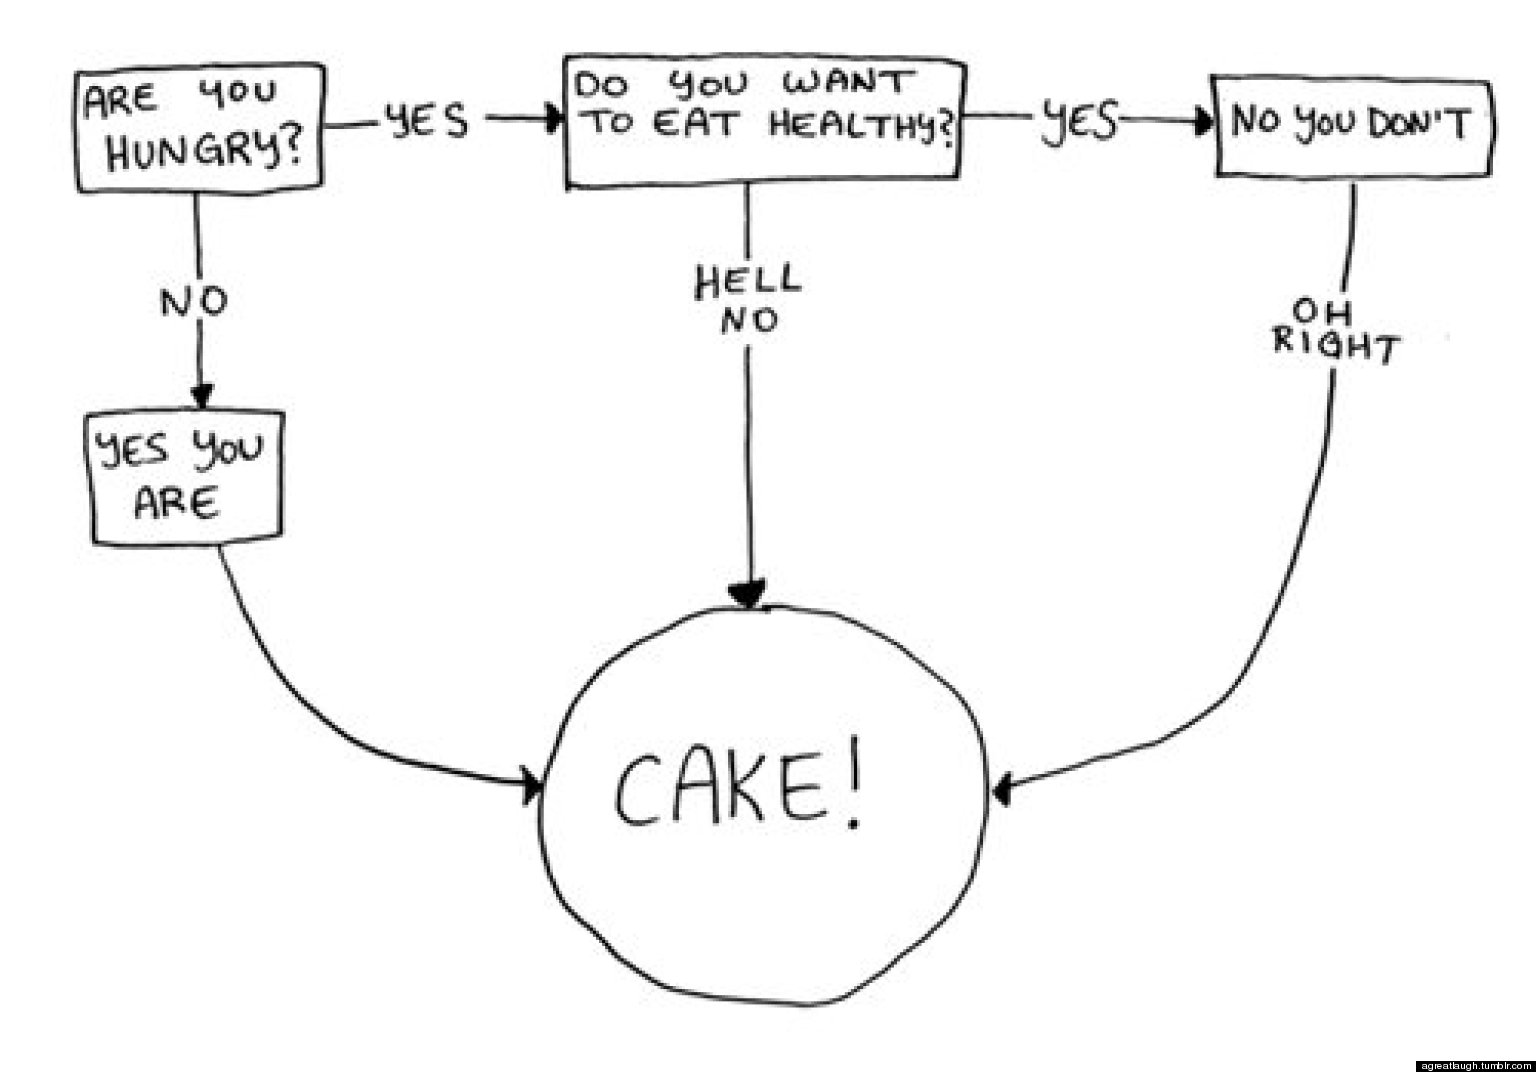 Do you want cake flowchart huffpost nvjuhfo Images